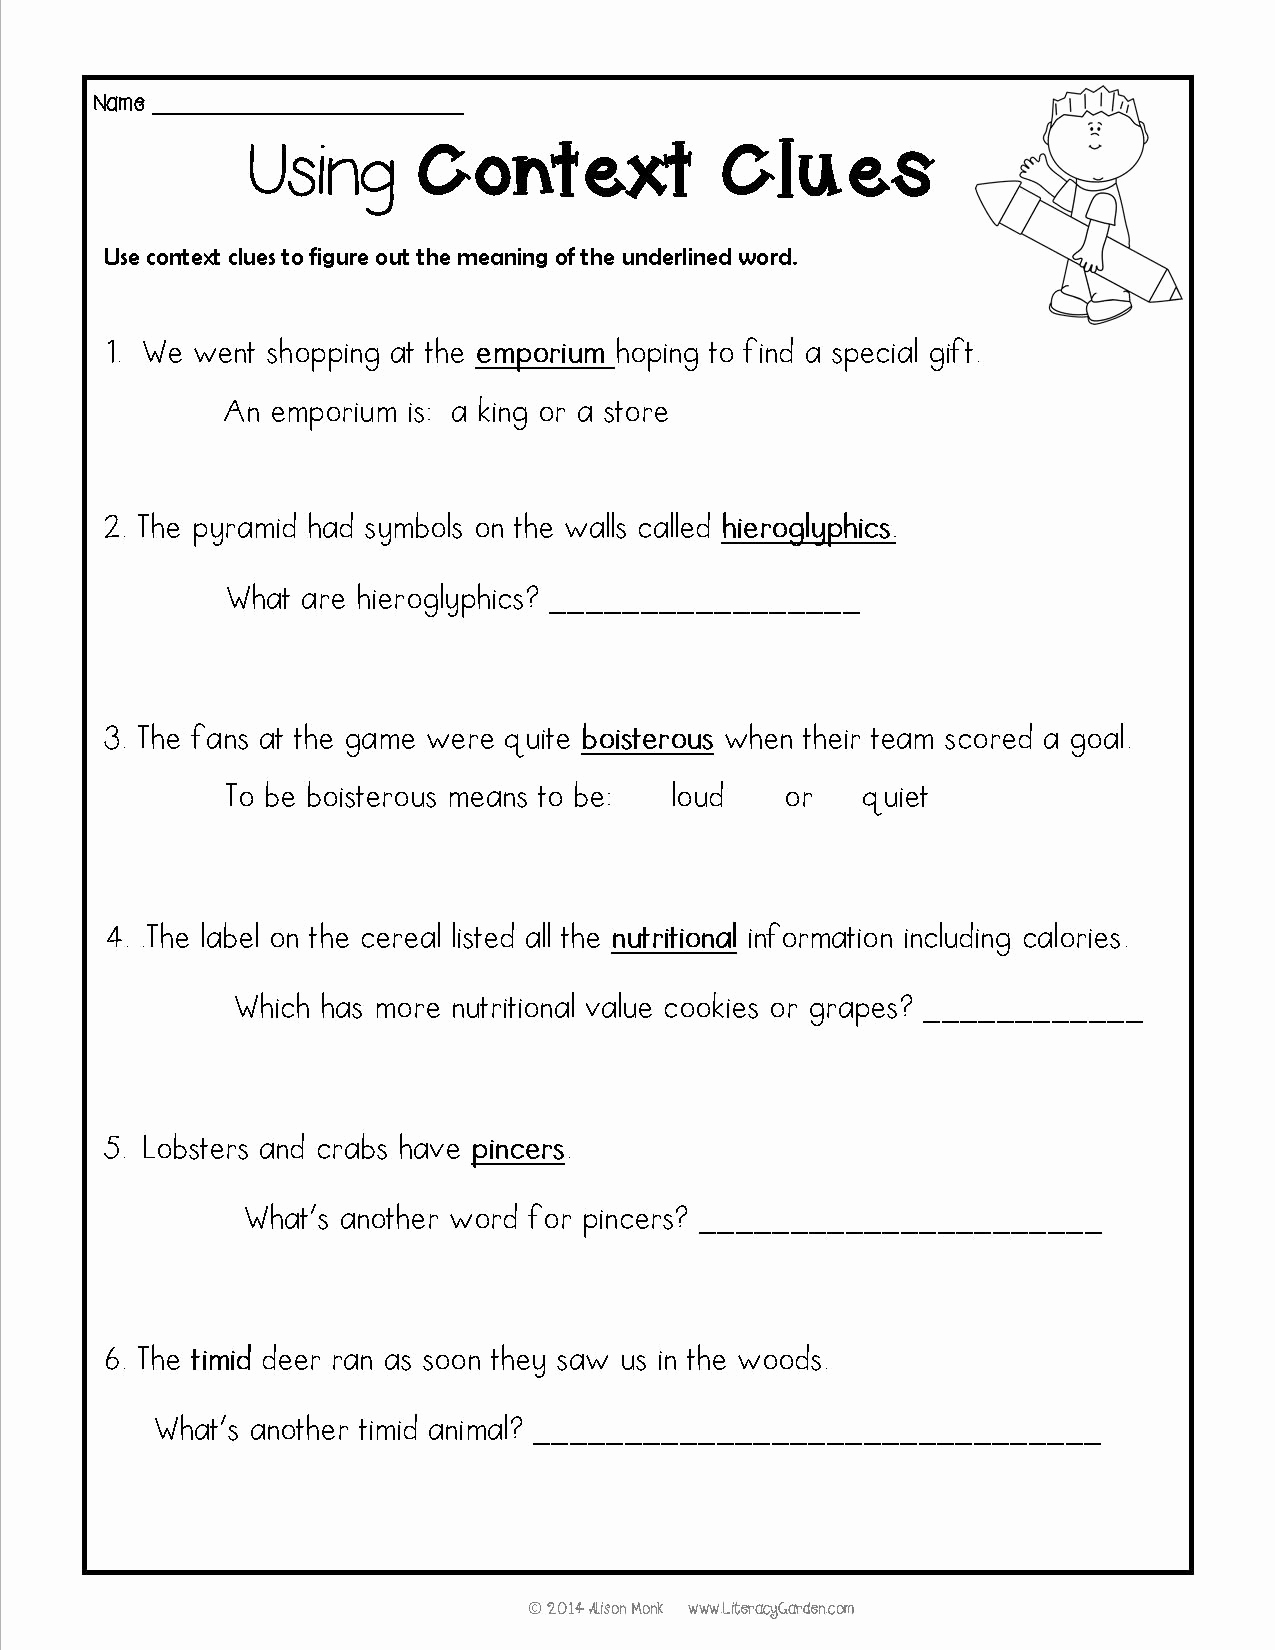 Context Clues 5th Grade Worksheets Beautiful Free Printable Context Clues Worksheets